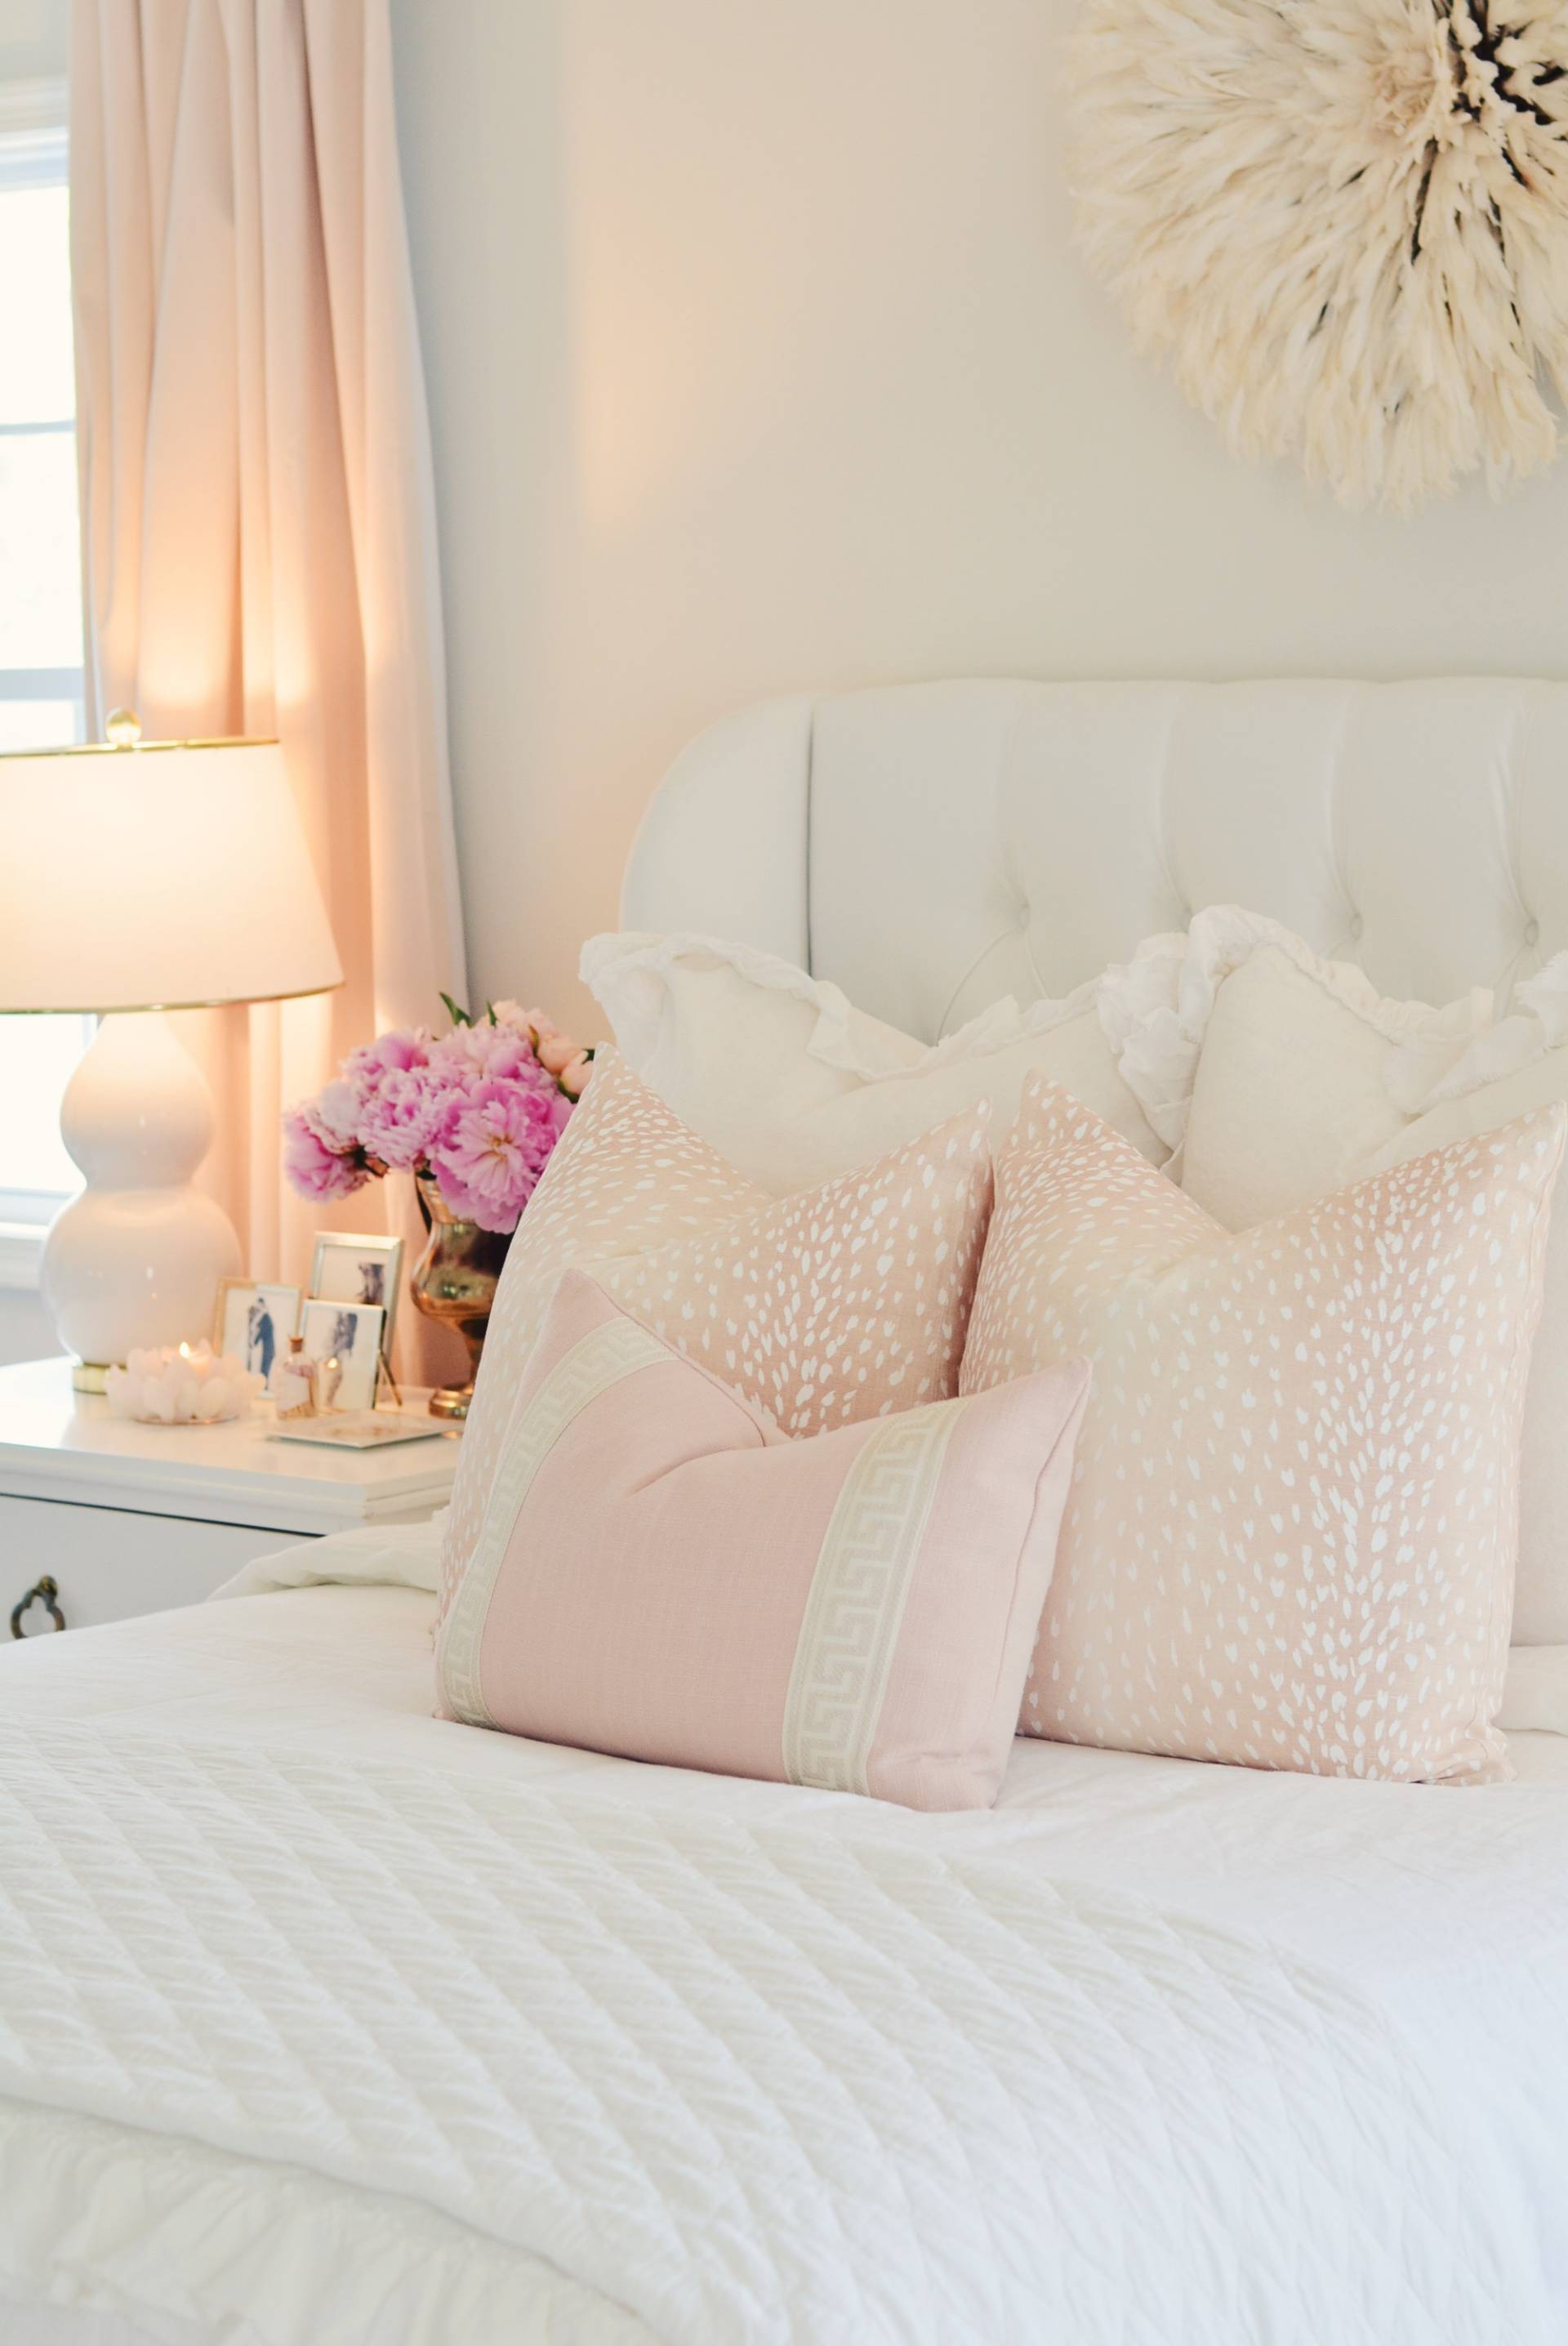 Elegant White Master Bedroom Blush Decorative Pillows The Pink Dream